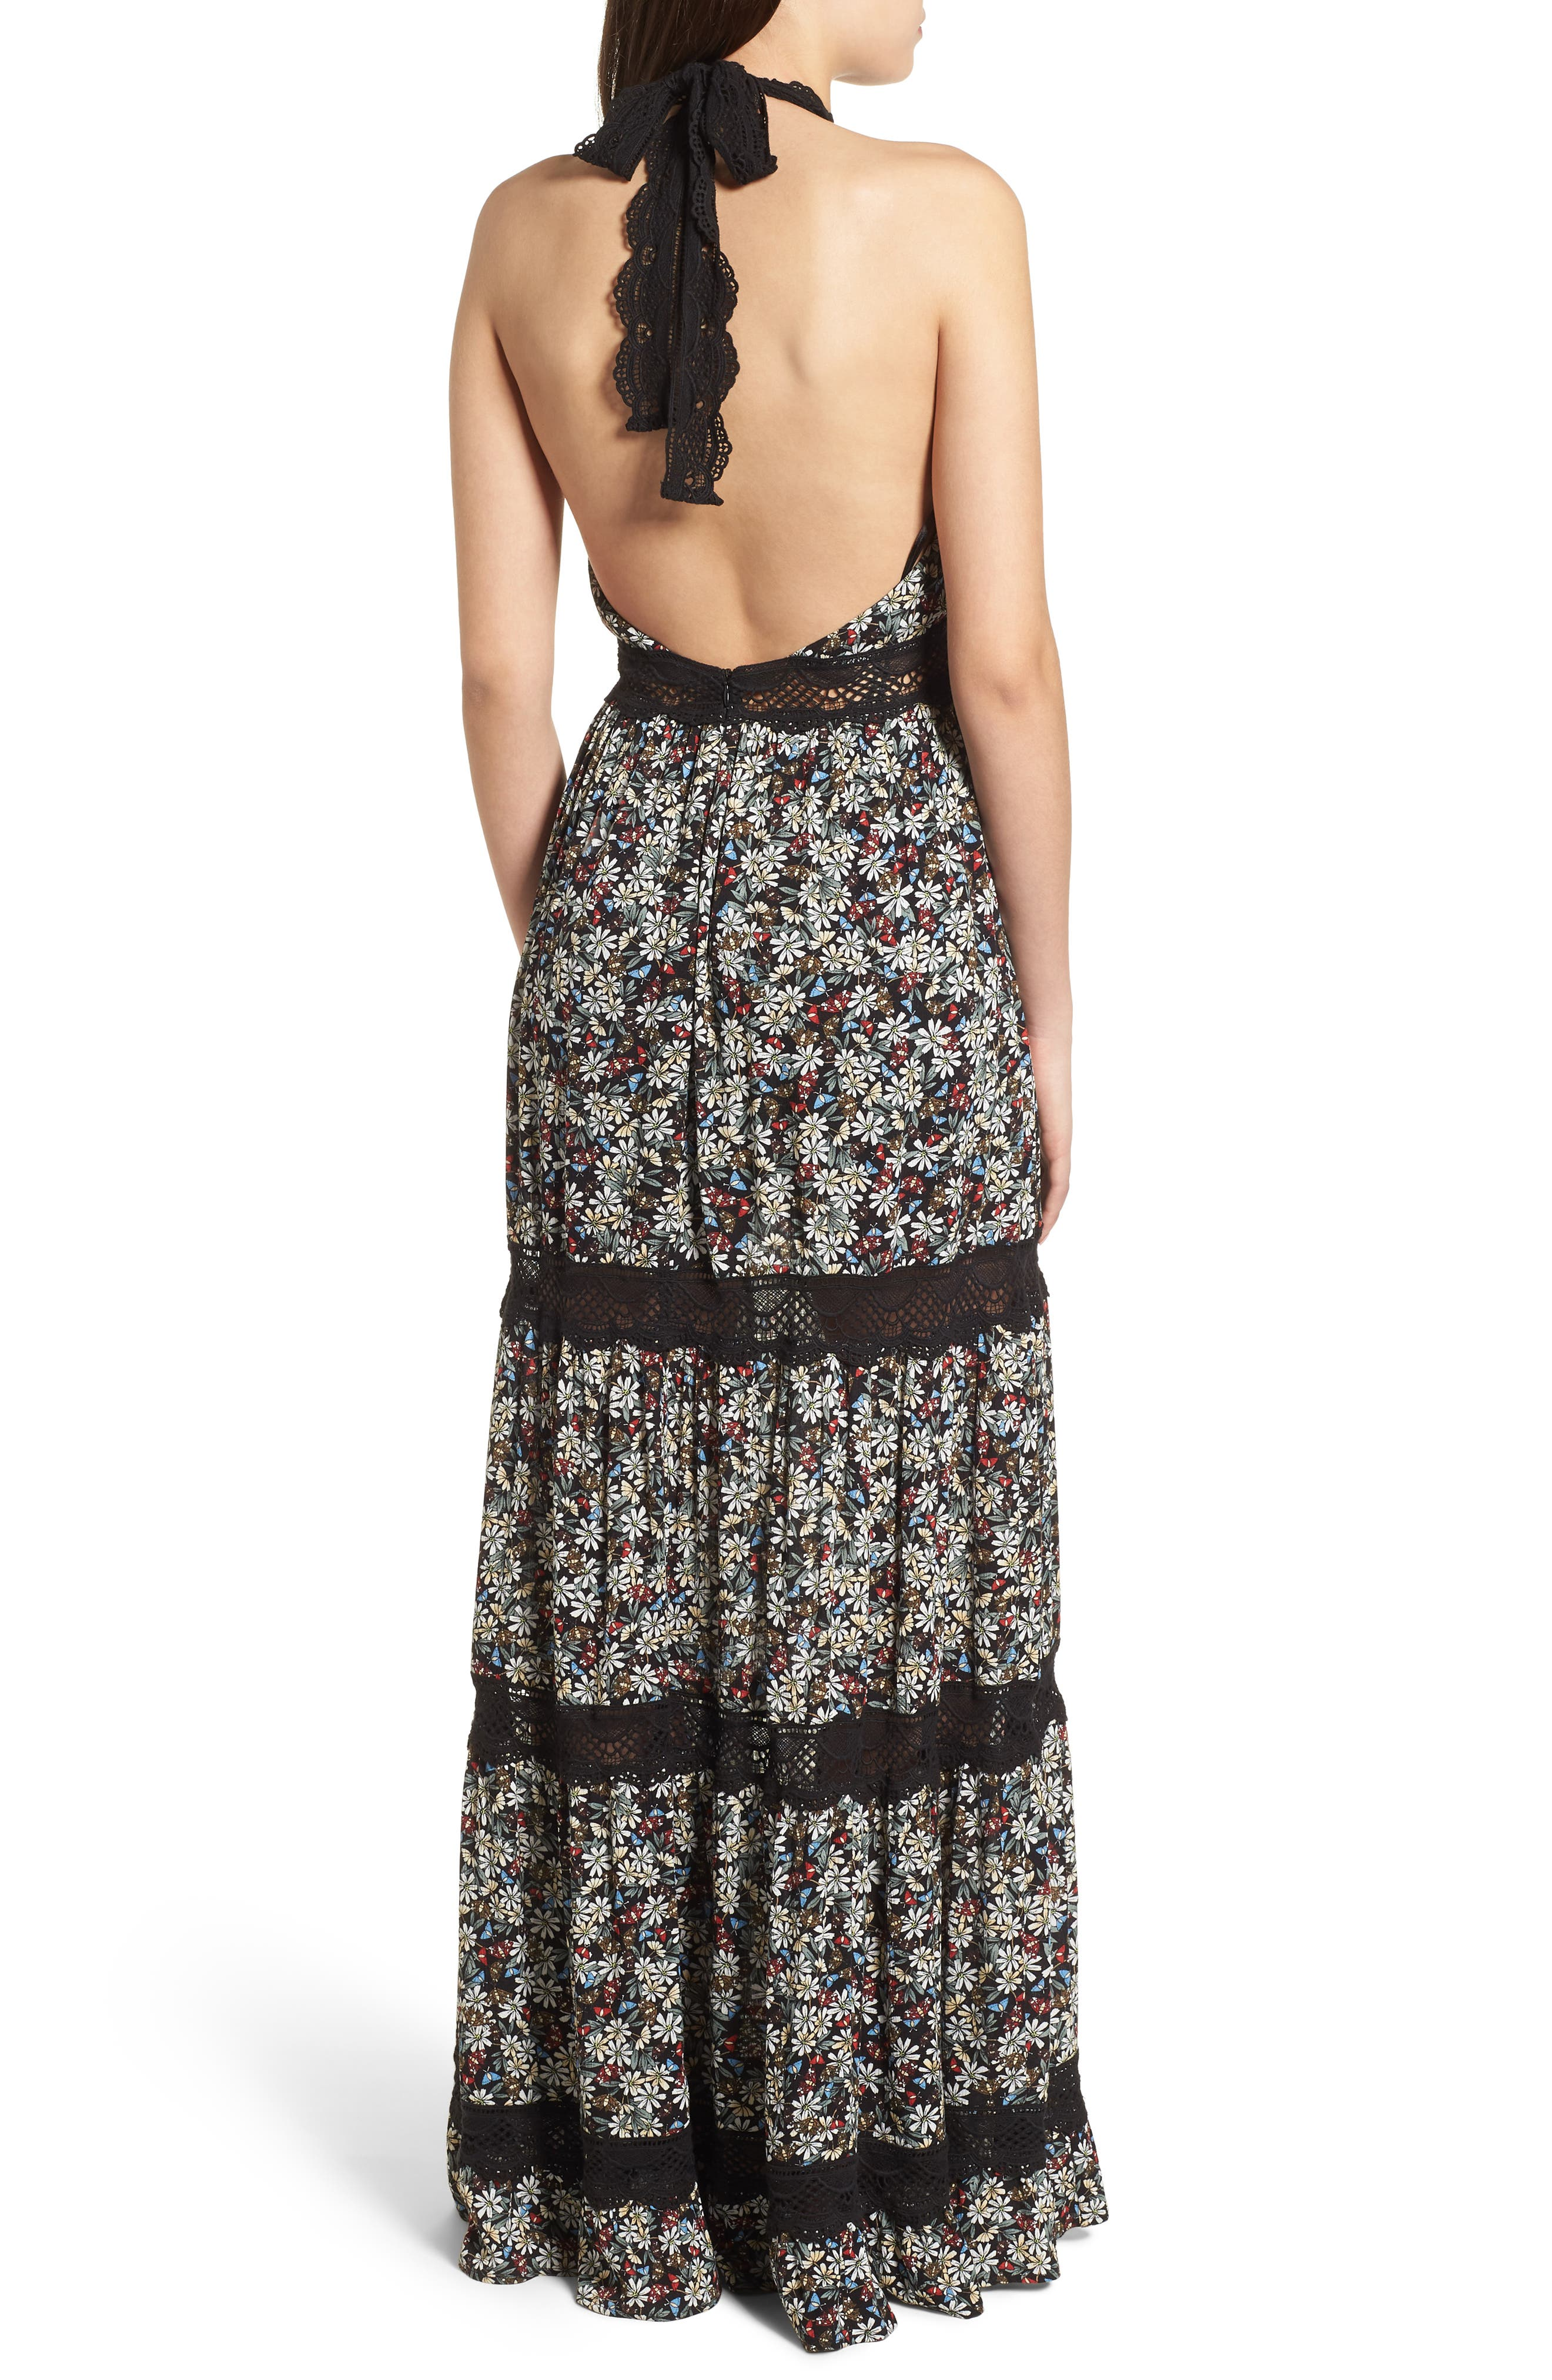 Flora Halter Neck Maxi Dress,                             Alternate thumbnail 3, color,                             Multi Black